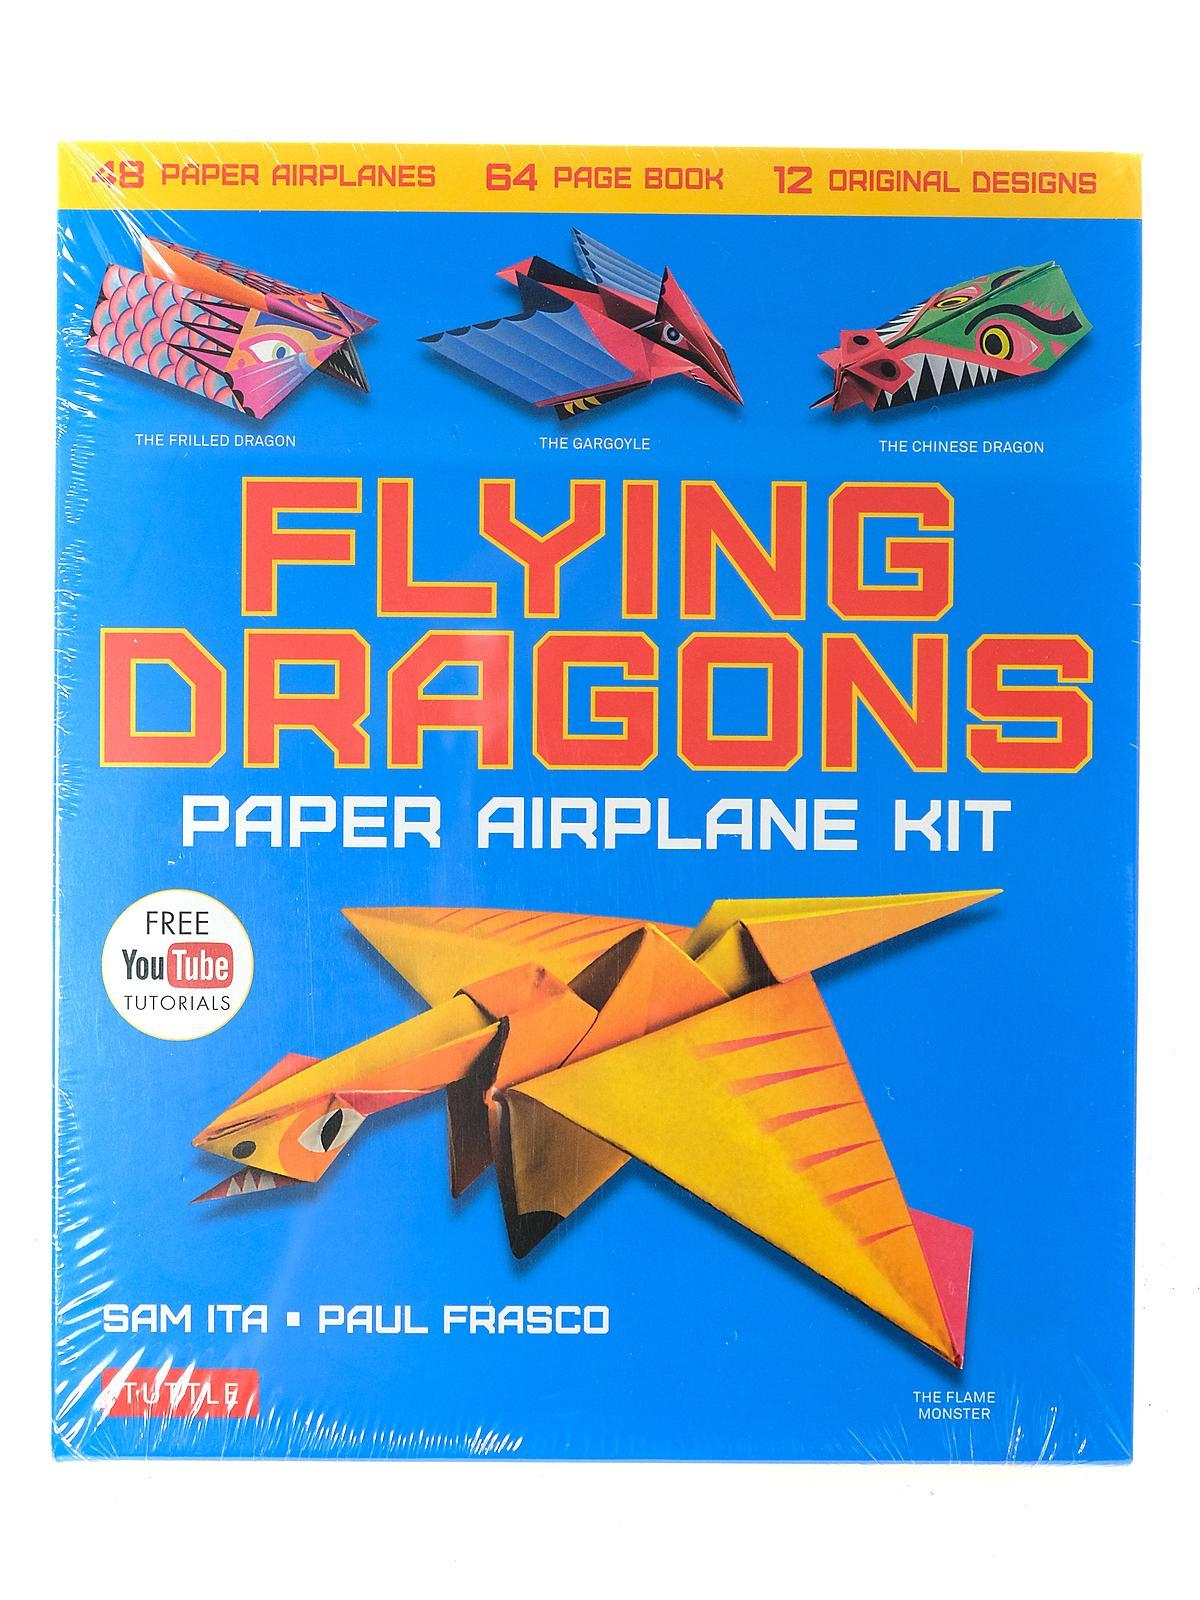 Flying Dragons: Paper Airplane Kit